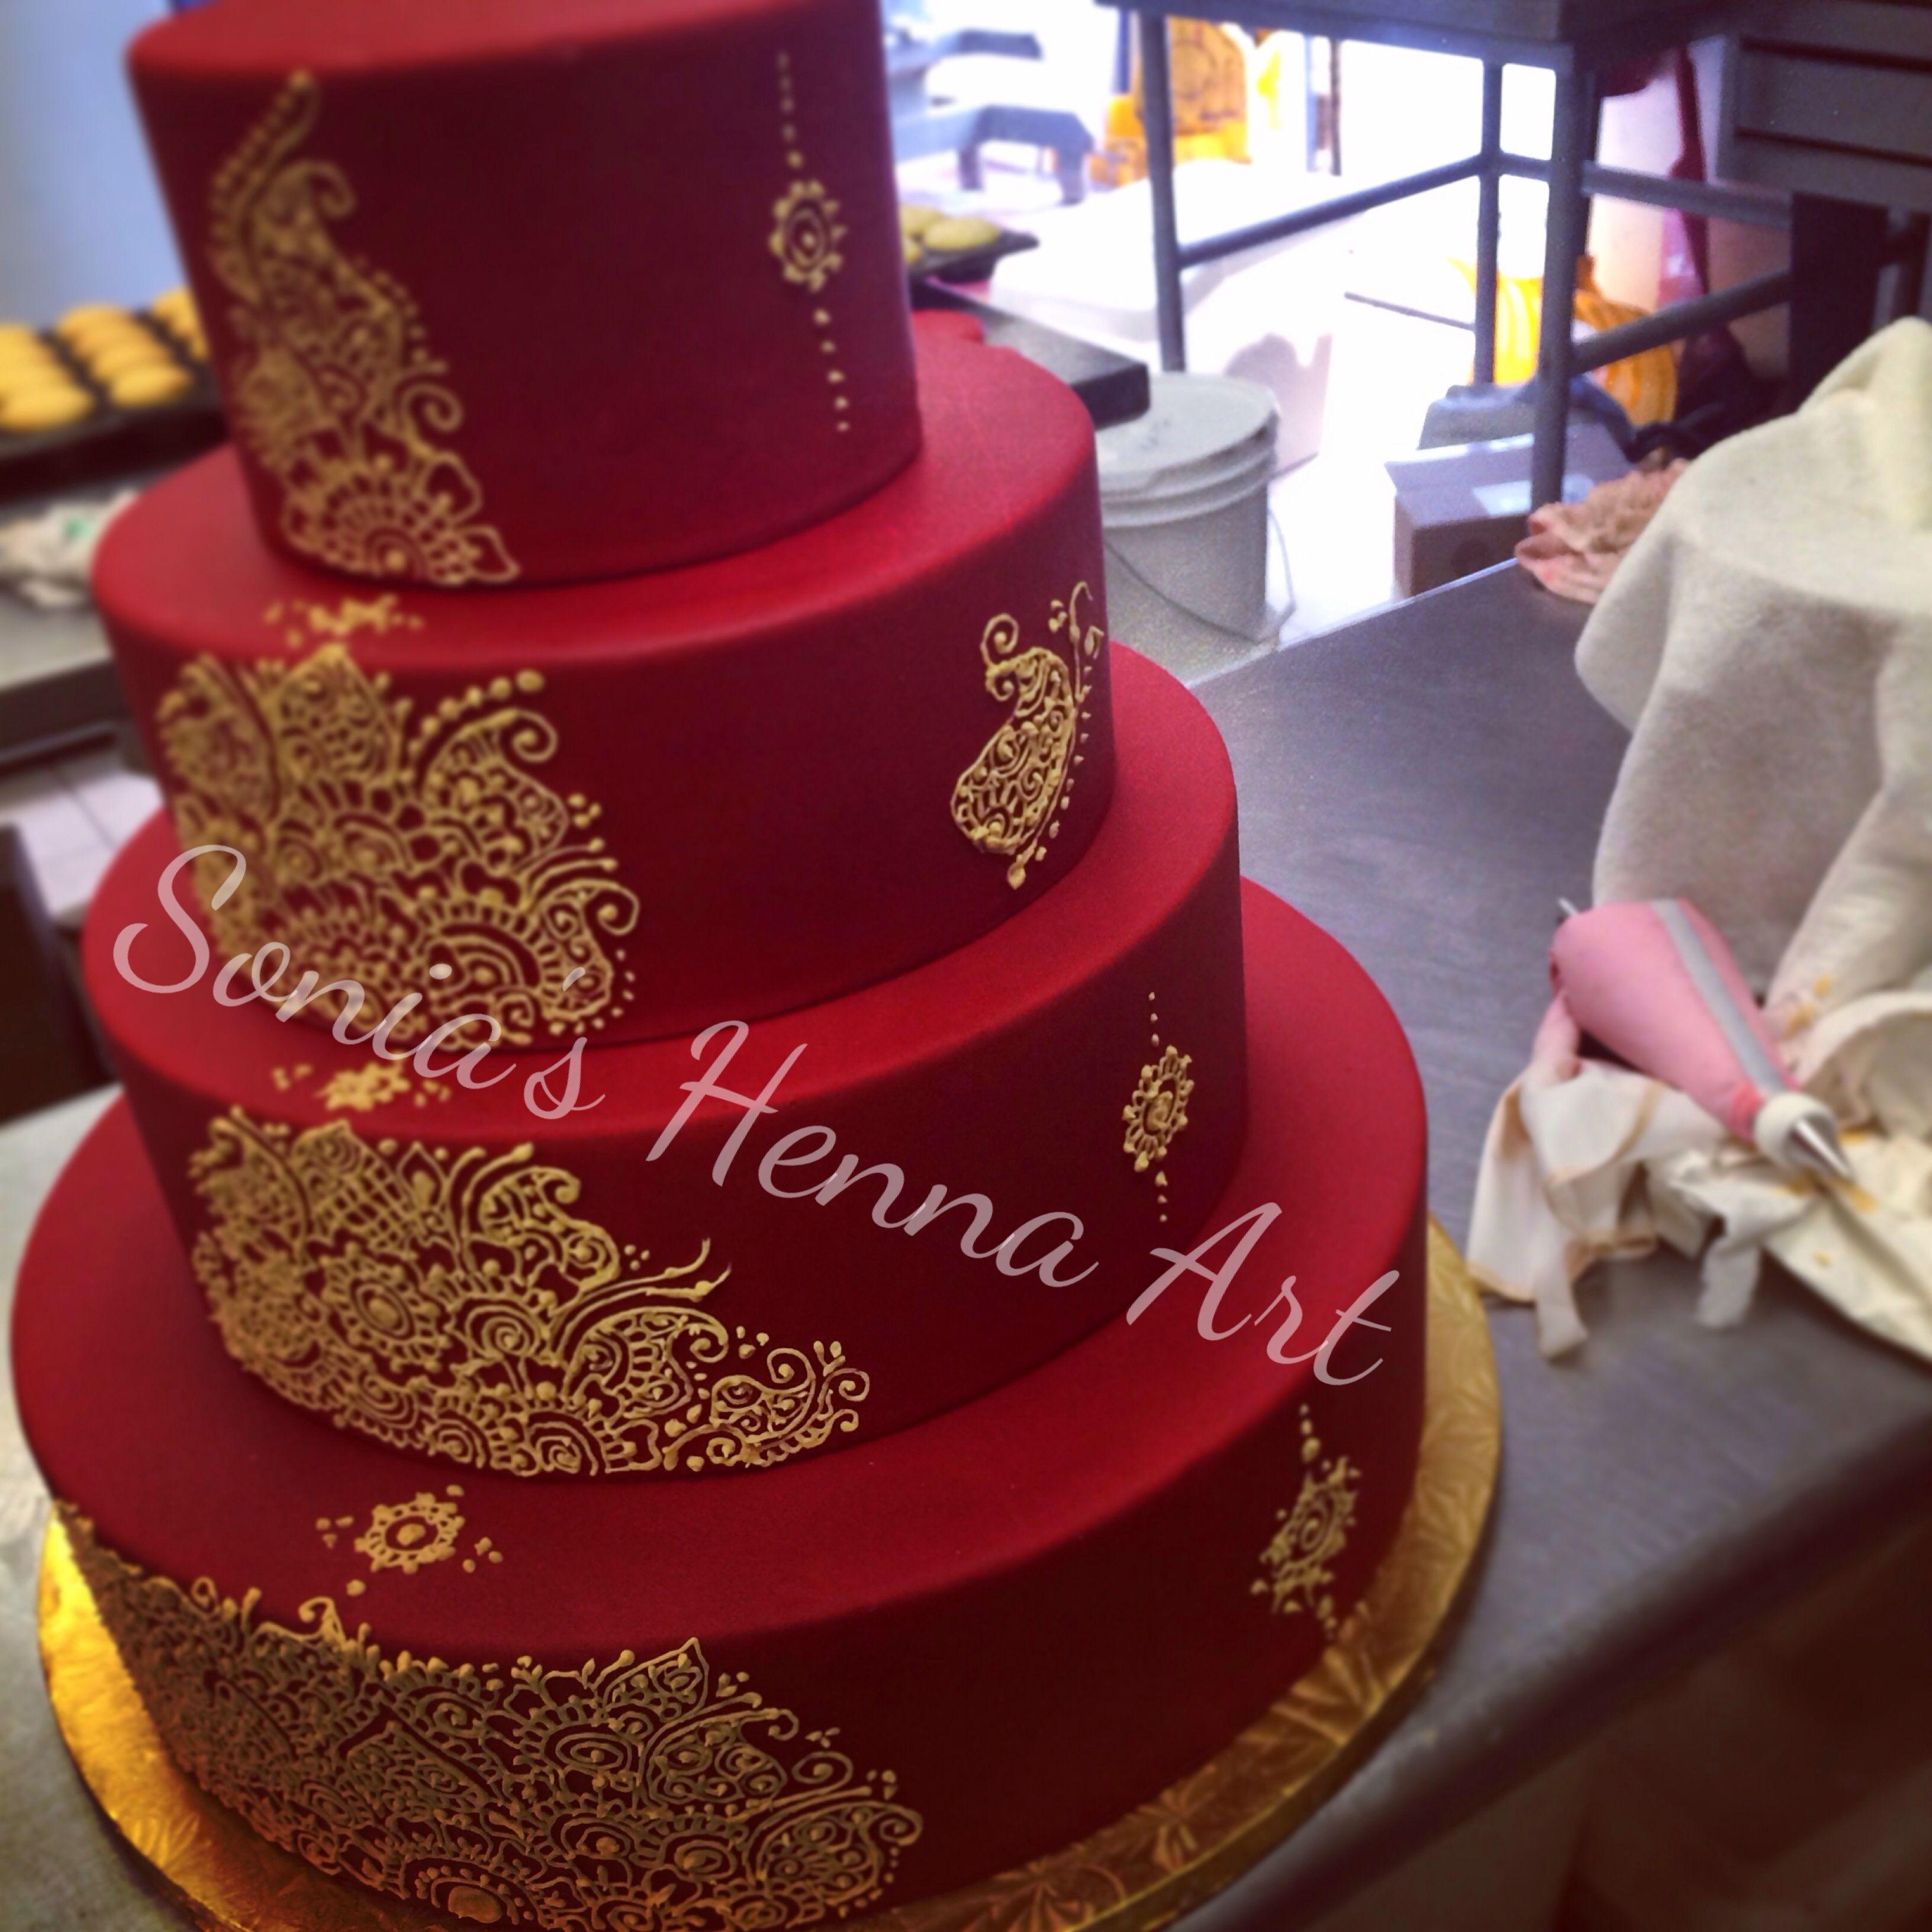 Henna Cake by Soniau0027s Henna Art Henna